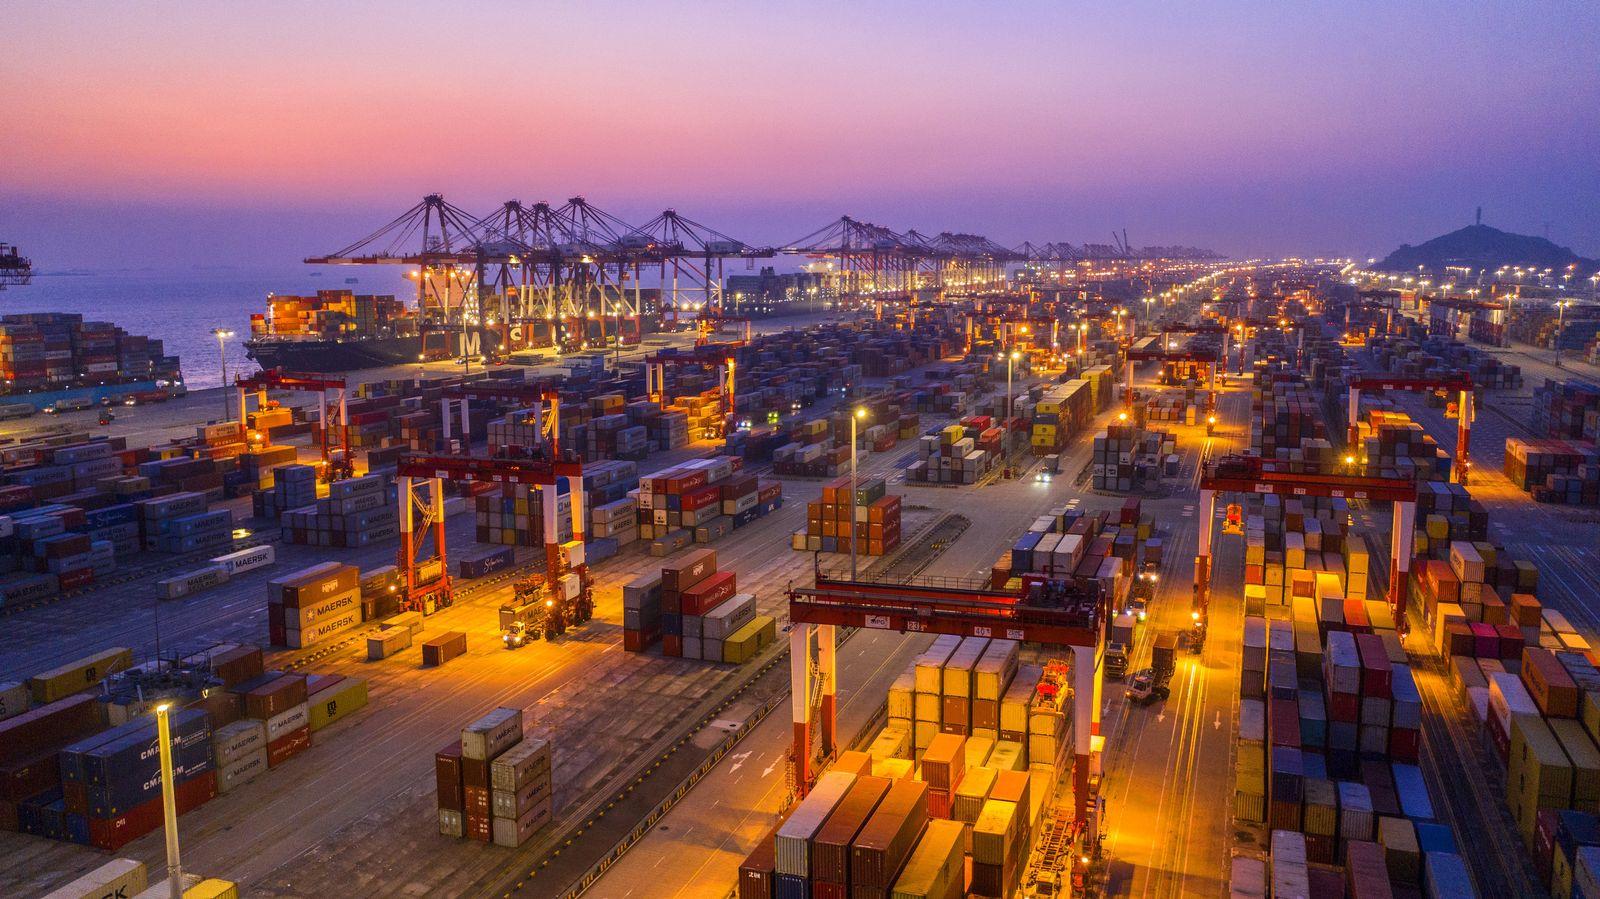 Containerhafen / Shanghai